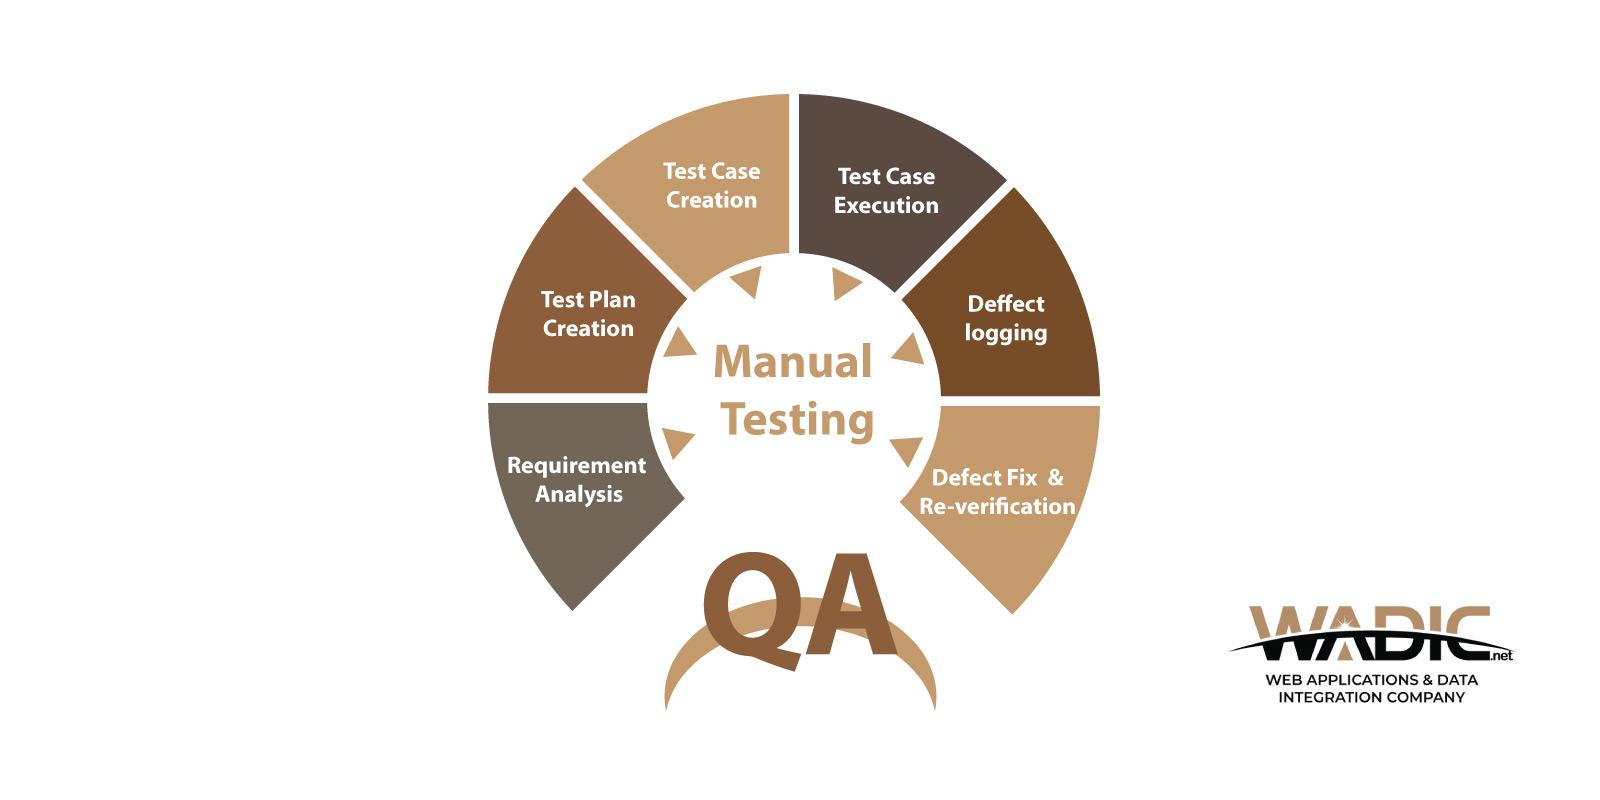 QA and Manual Testing